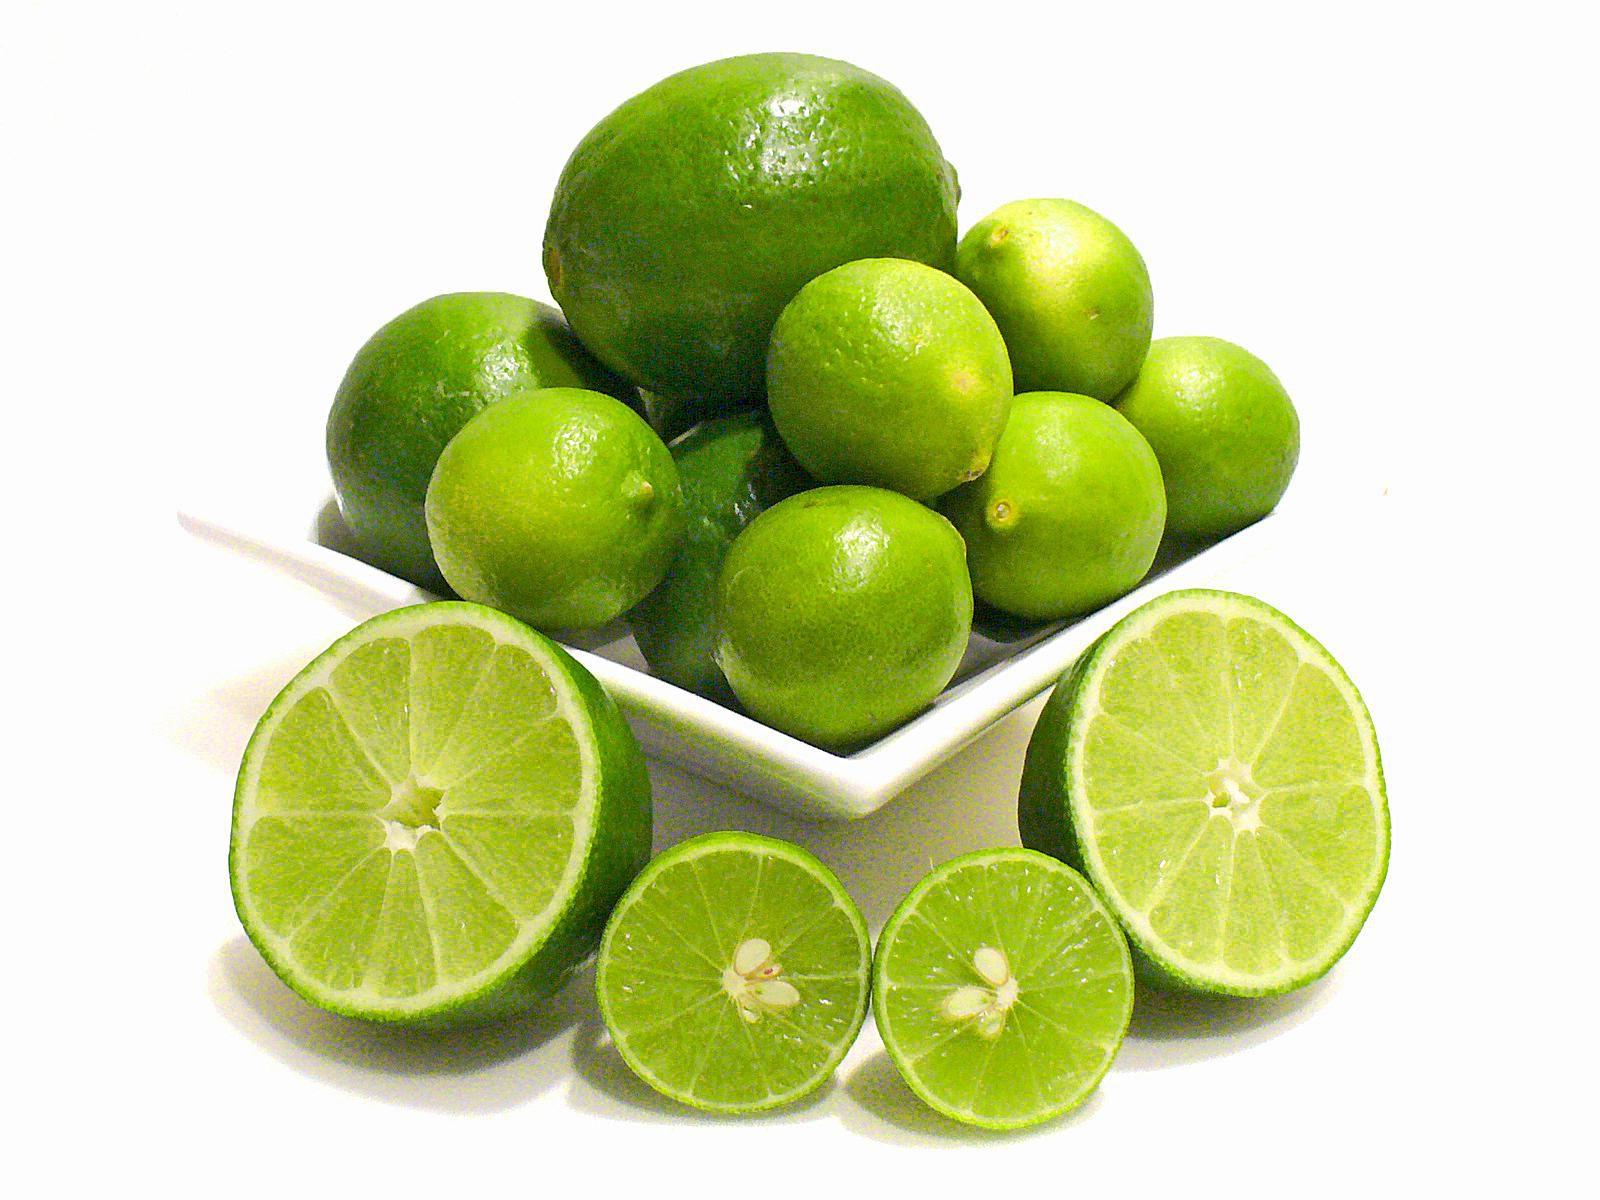 What are persian tahiti limes